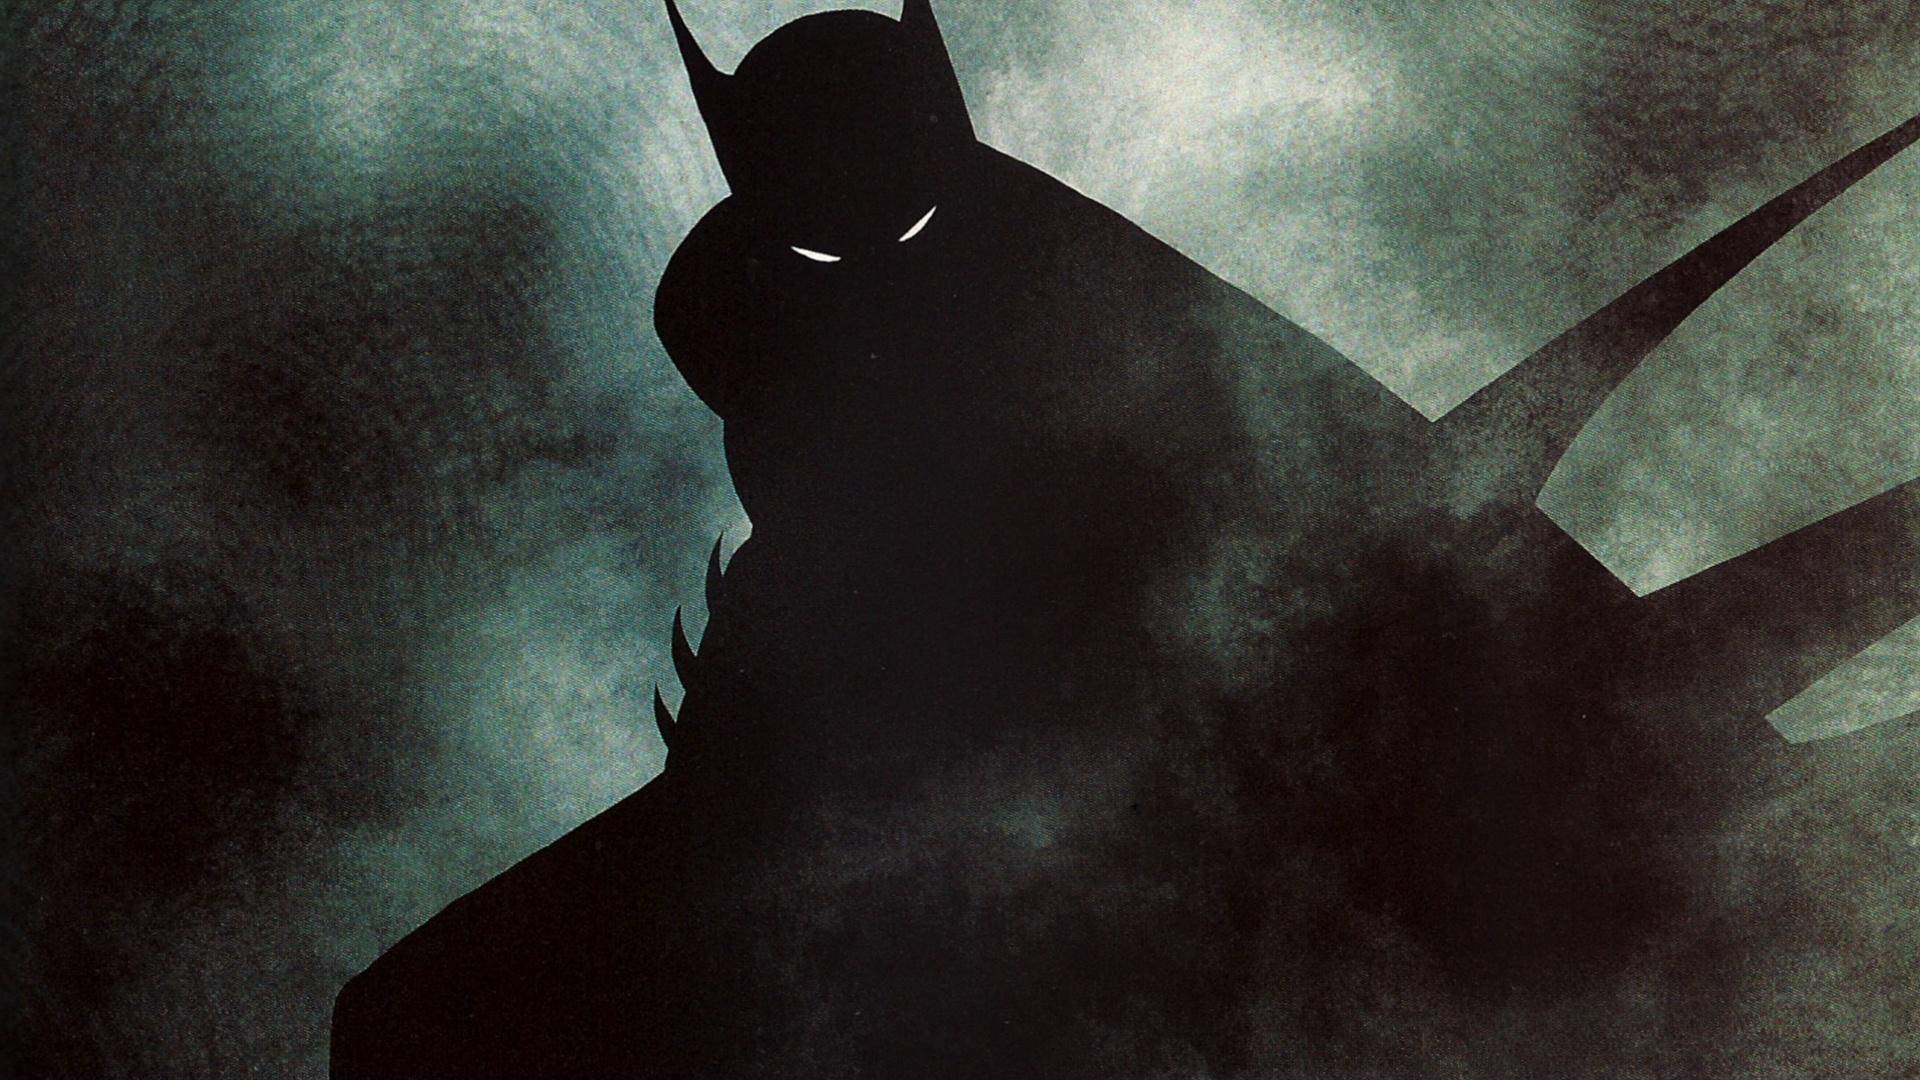 Batman Hd Wallpaper Background Image 1920x1080 Id 437962